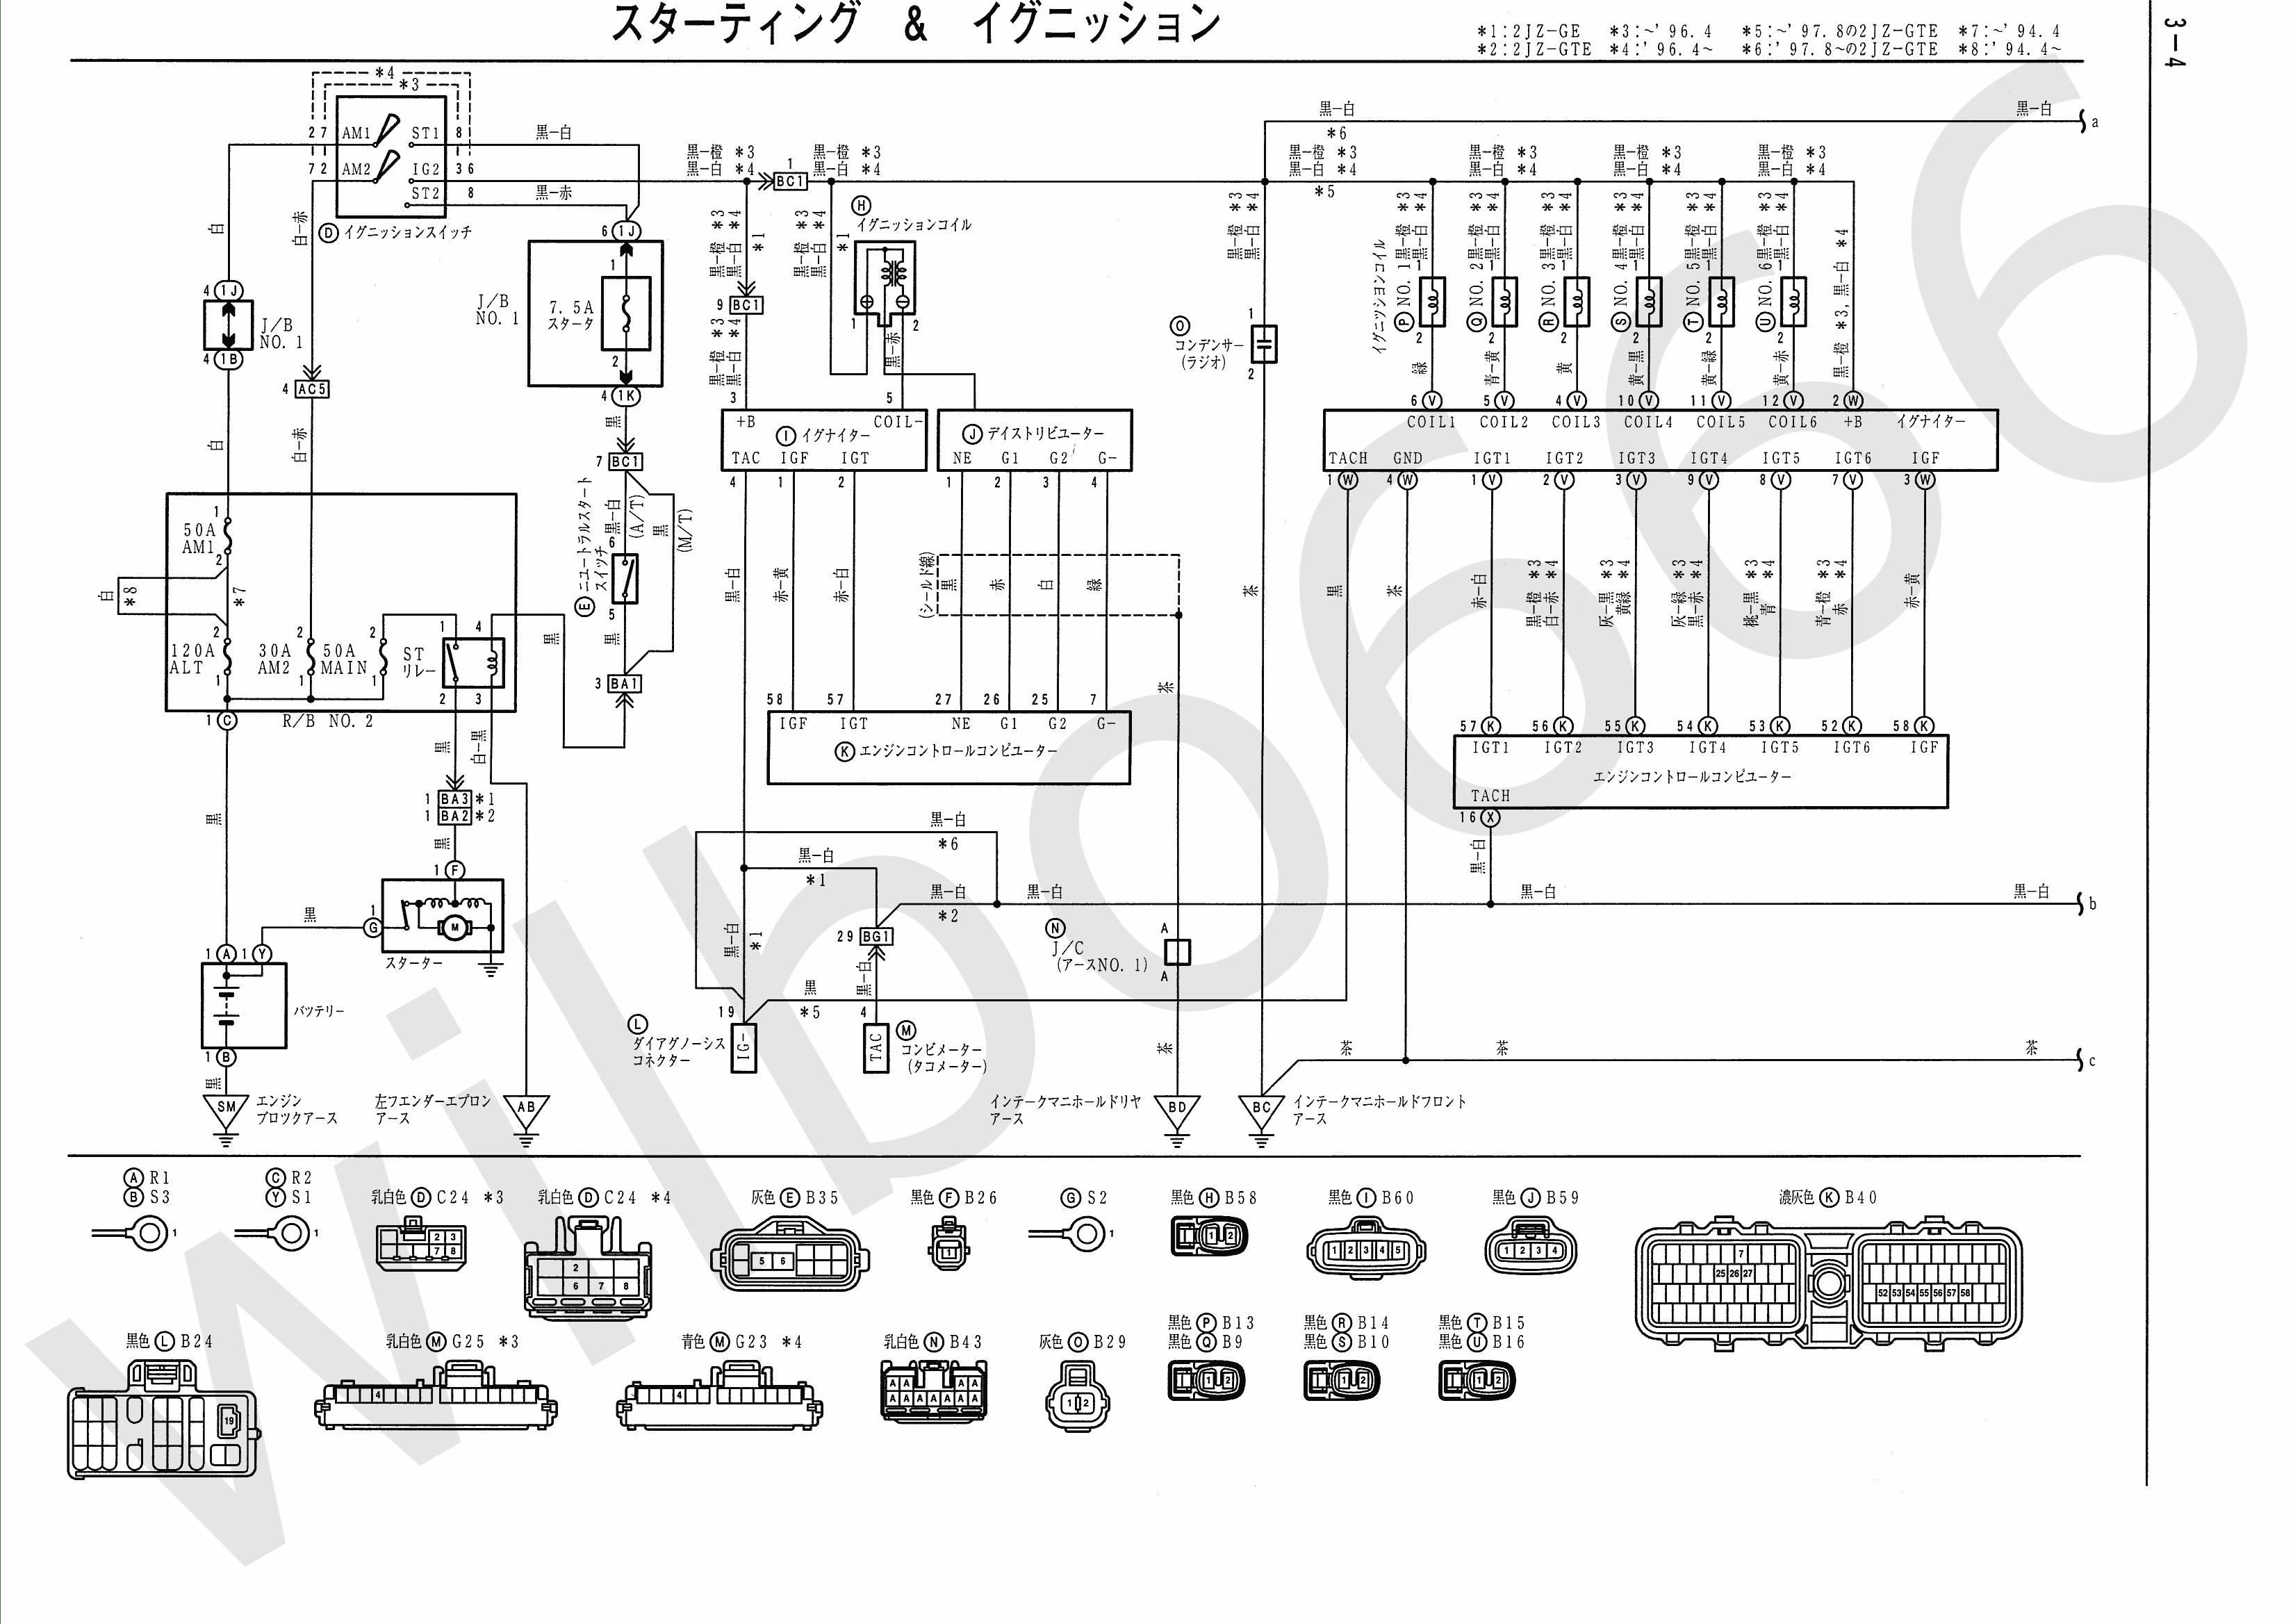 JZA80 Electrical Wiring Diagram 6742505 3 4?resize\\\\\\\\=665%2C471 bobcat 3400 wiring diagram john deere gator wiring diagram, ford ford 3400 wiring diagram at readyjetset.co